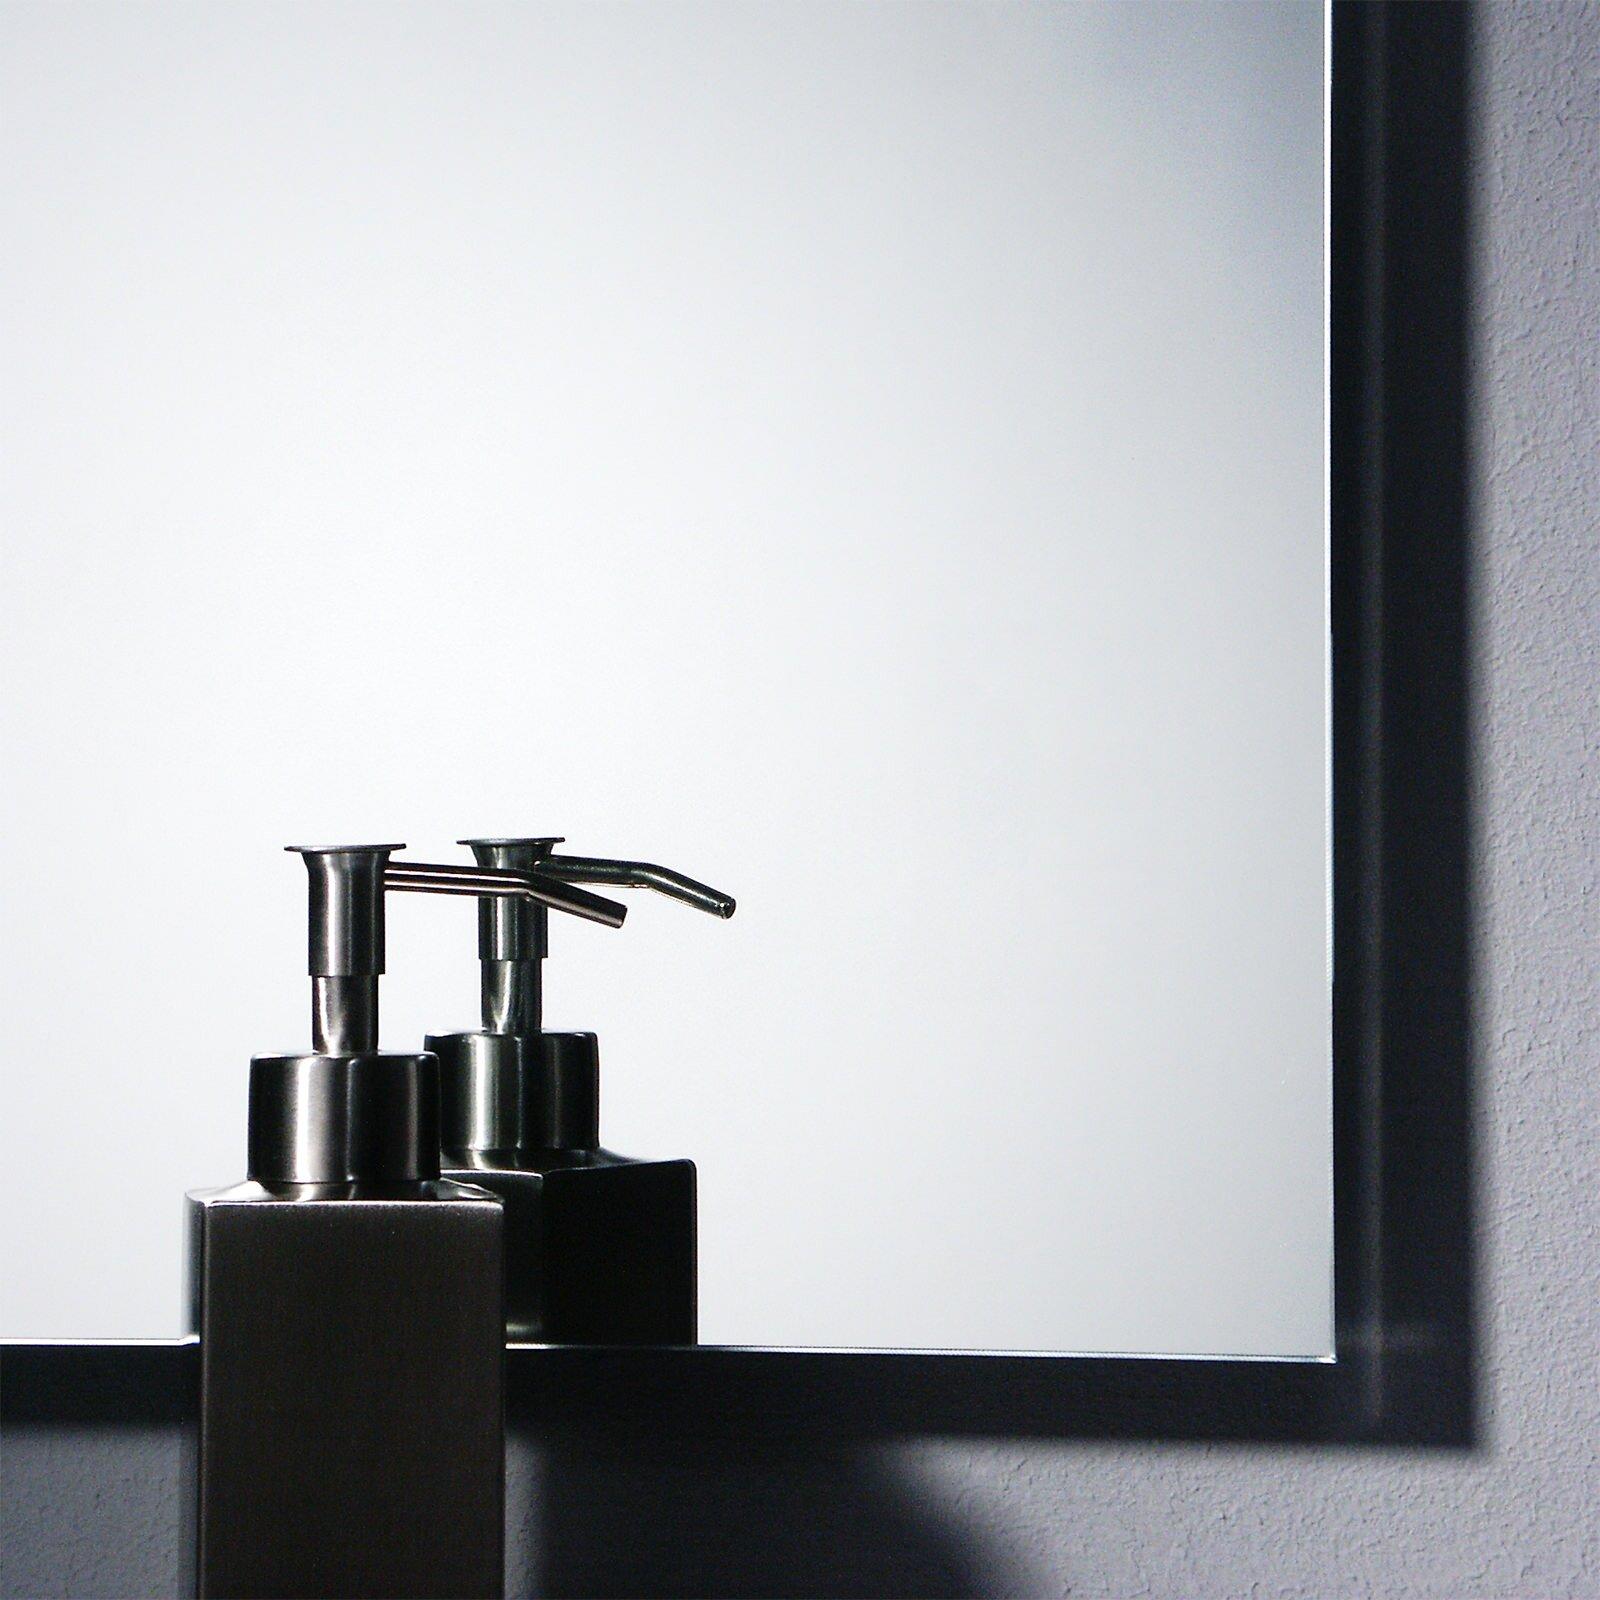 badspiegel basic spiegel nach ma und in 26 standardgr en top qualit t. Black Bedroom Furniture Sets. Home Design Ideas